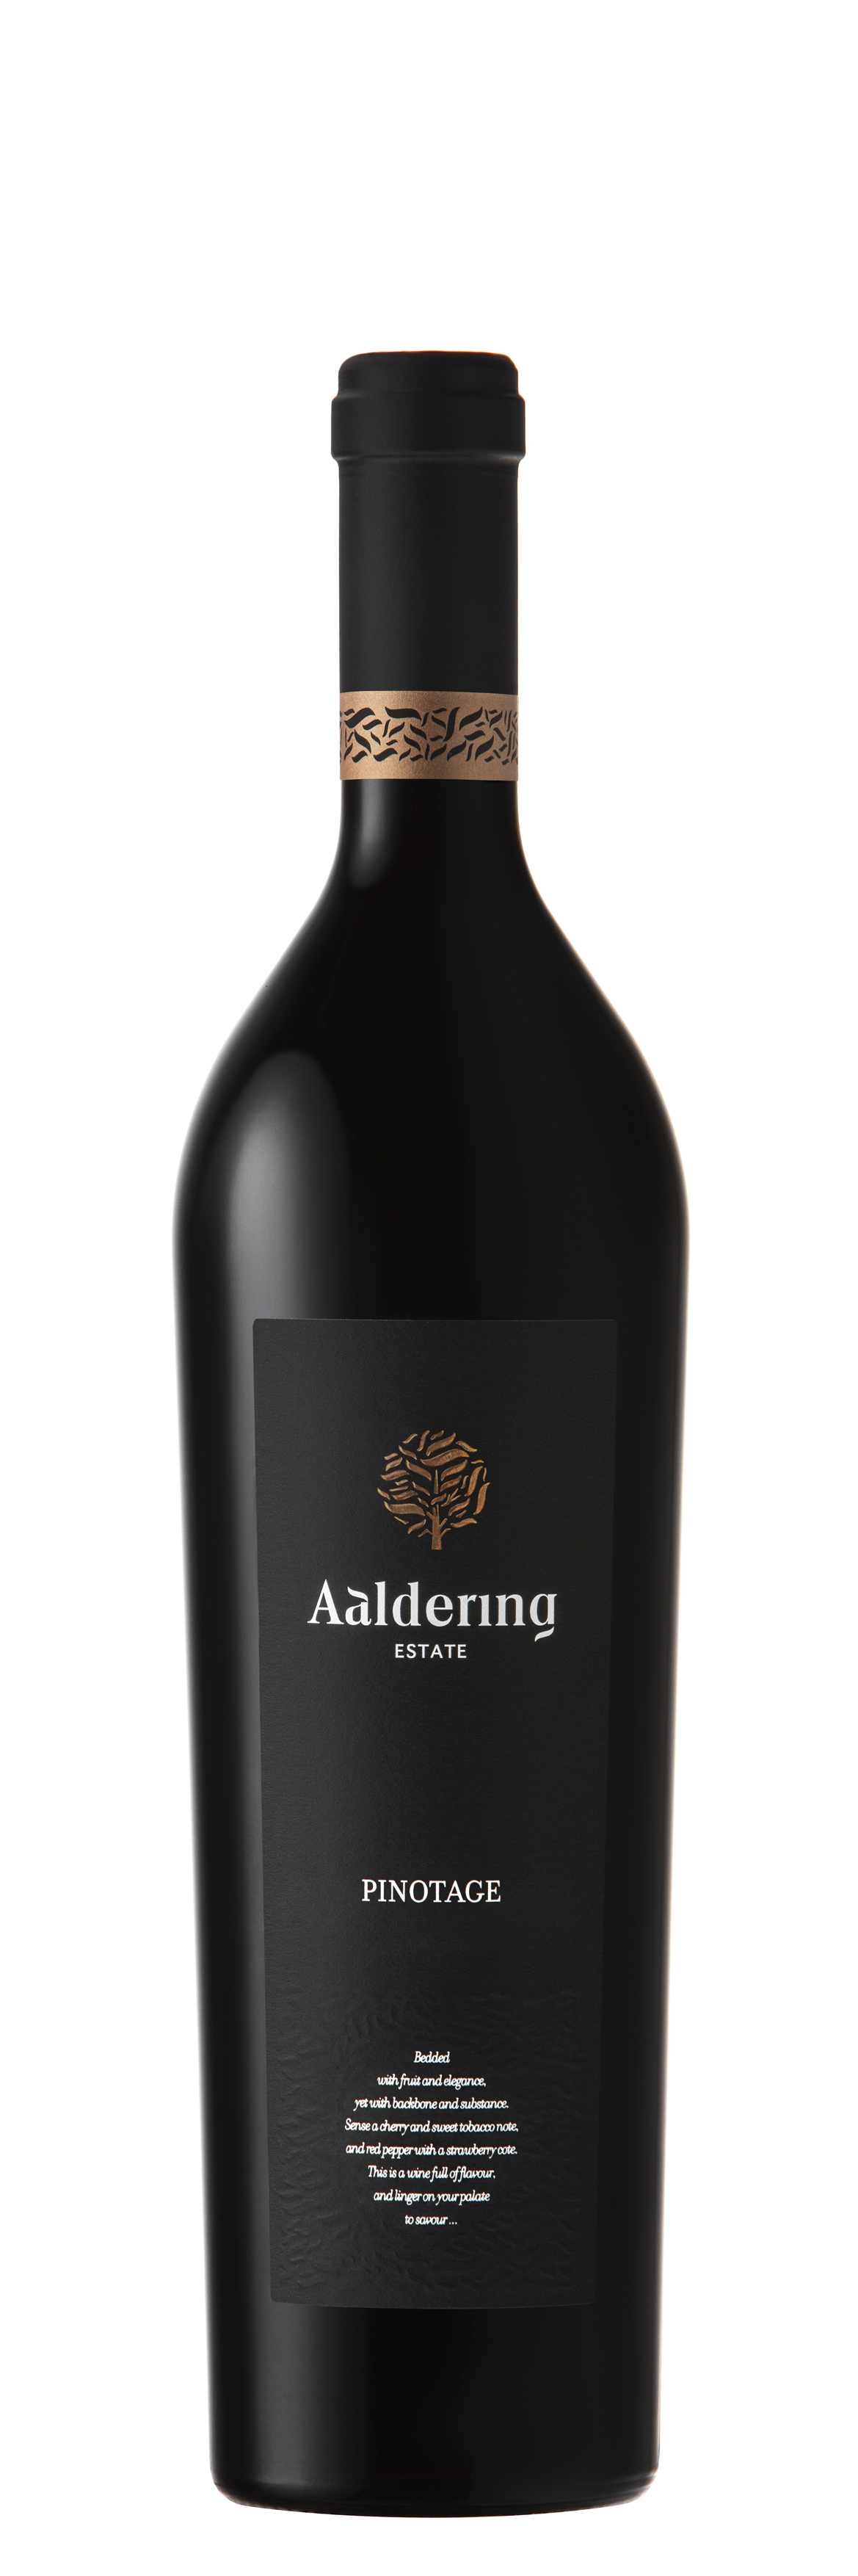 Aaldering Pinotage 2018